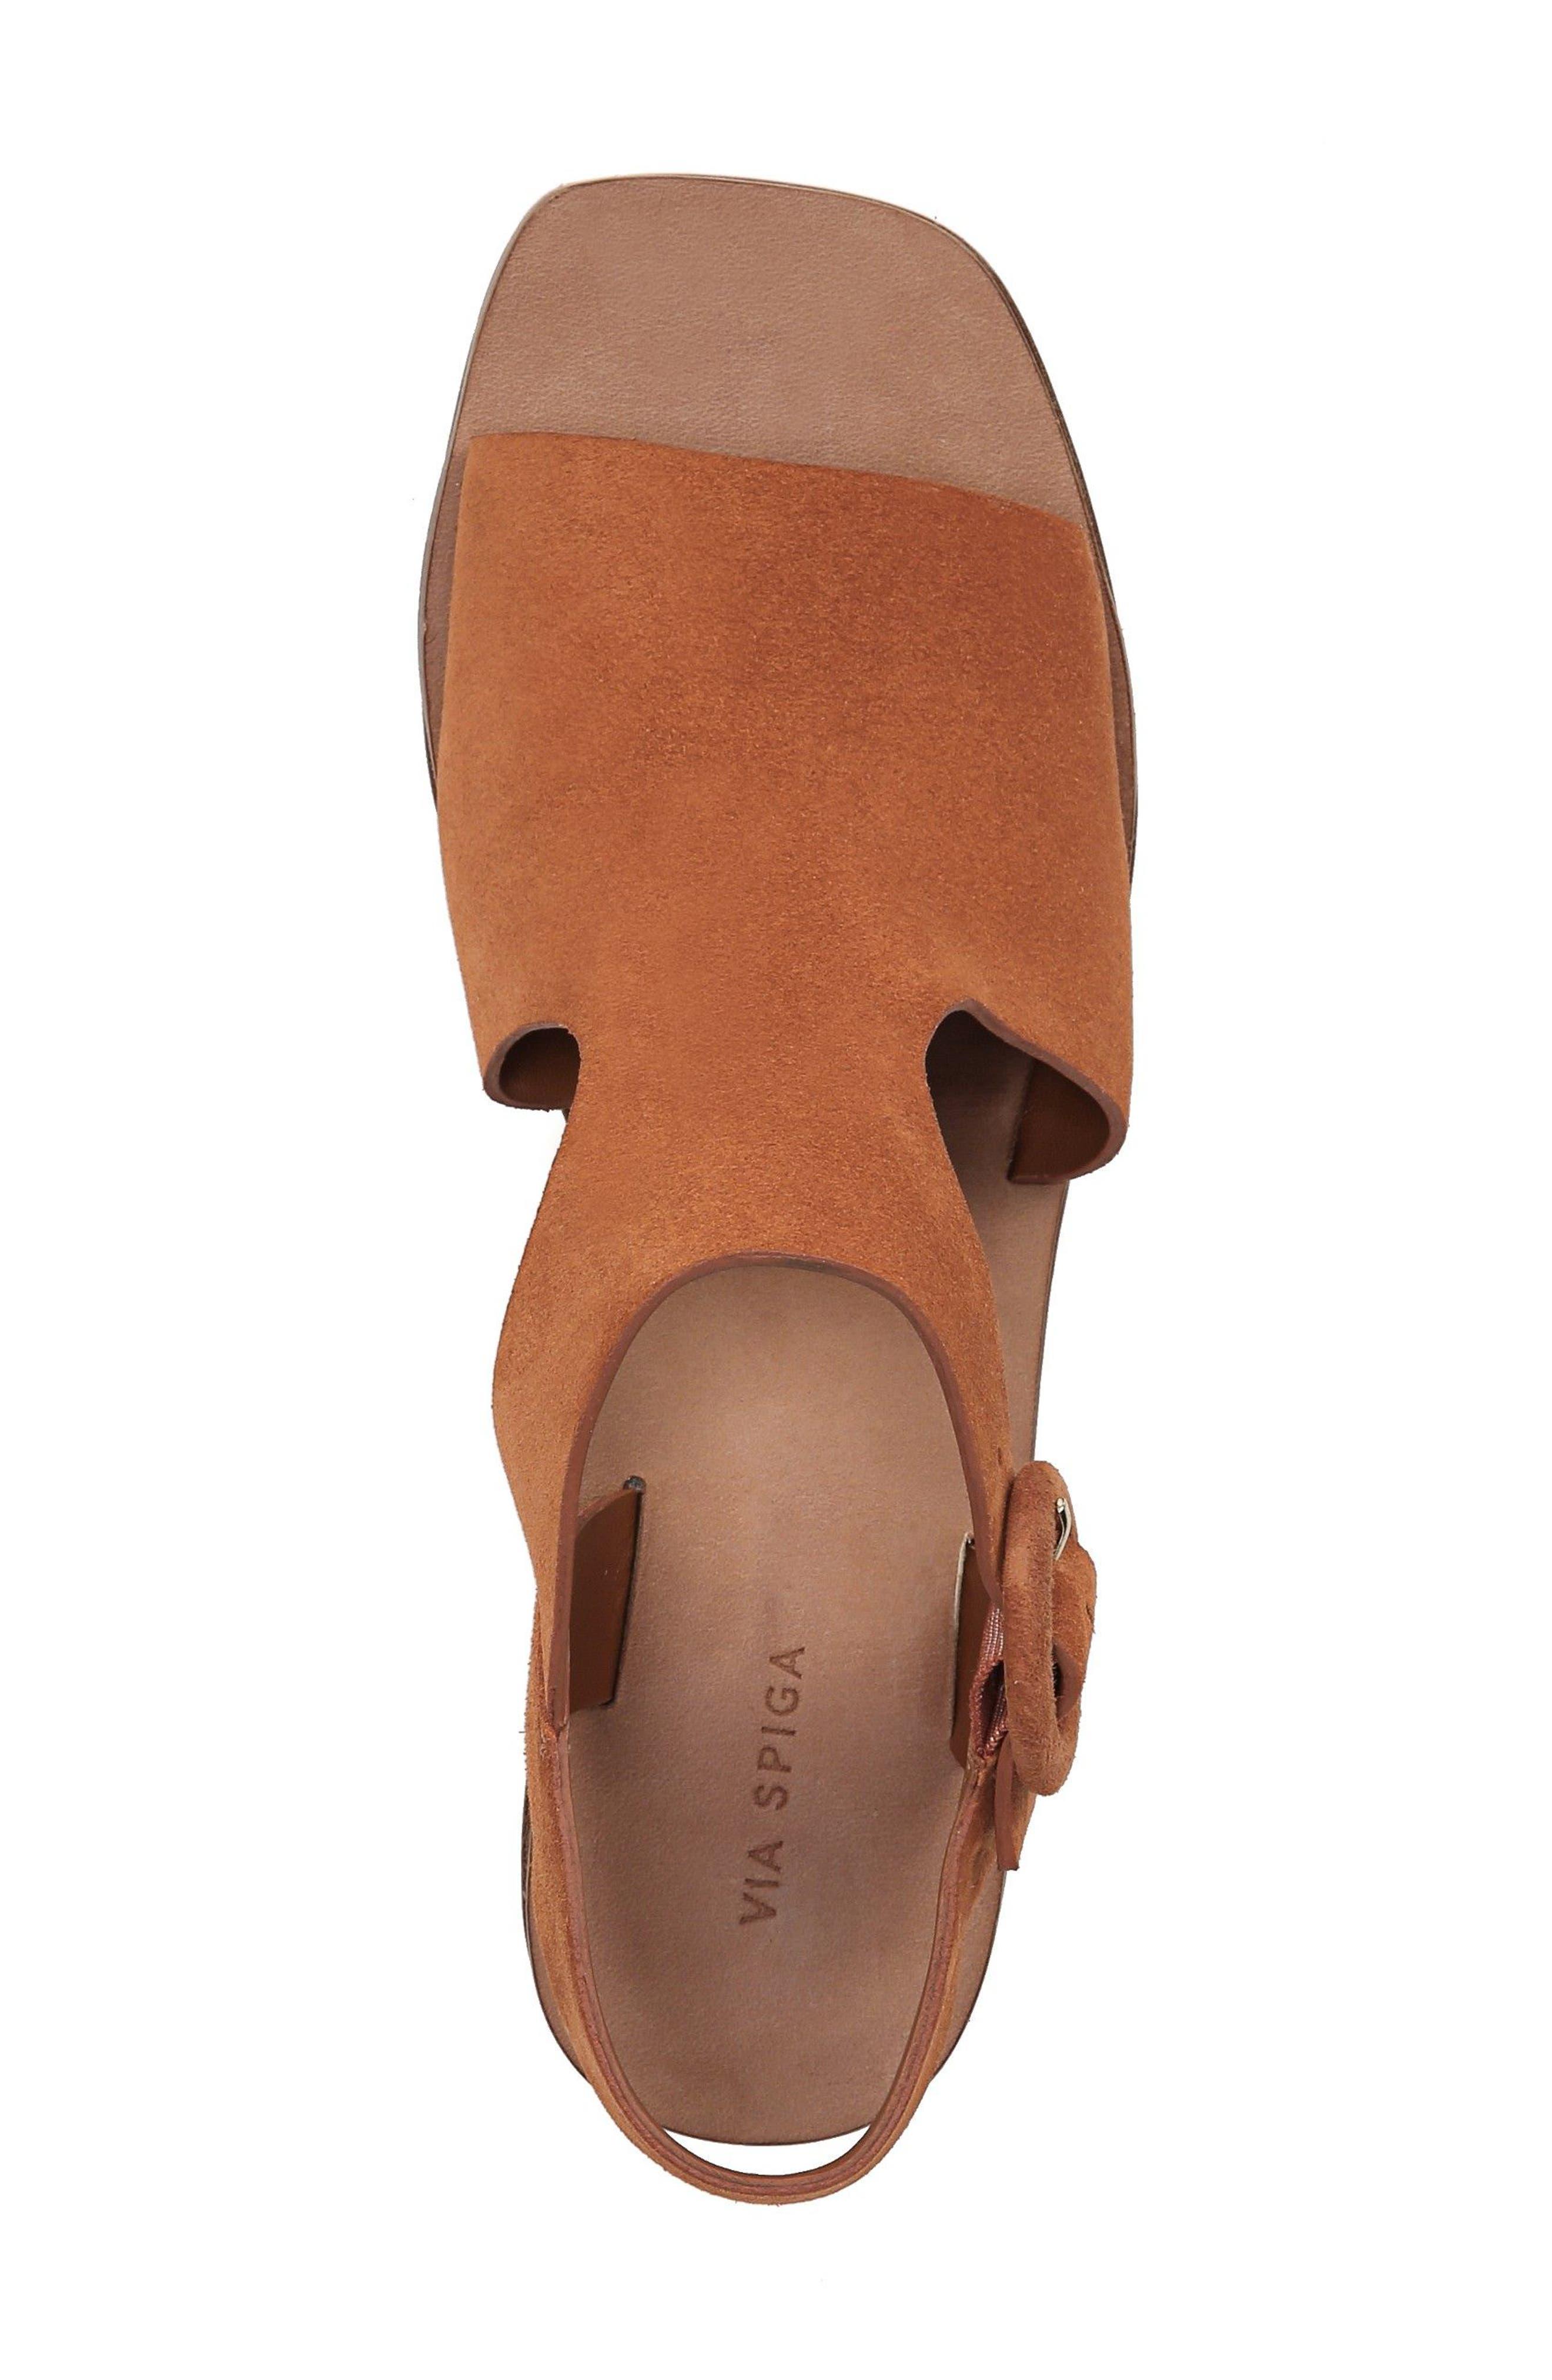 Katya Shield Sandal,                             Alternate thumbnail 5, color,                             Amber Suede